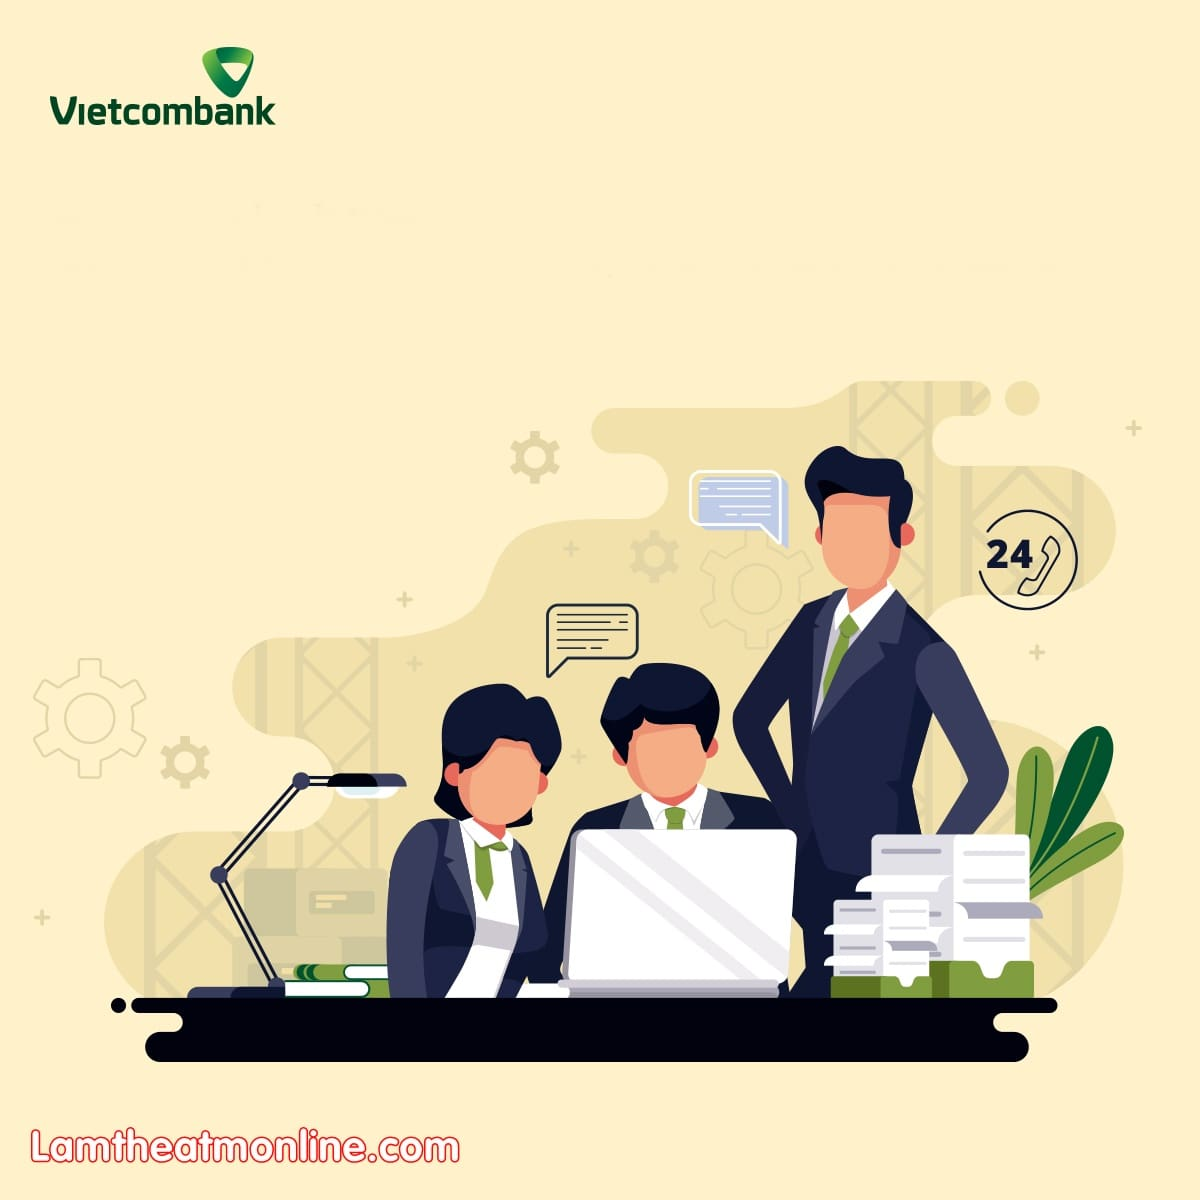 Kiem tra the vietcombank con su dung duoc khong